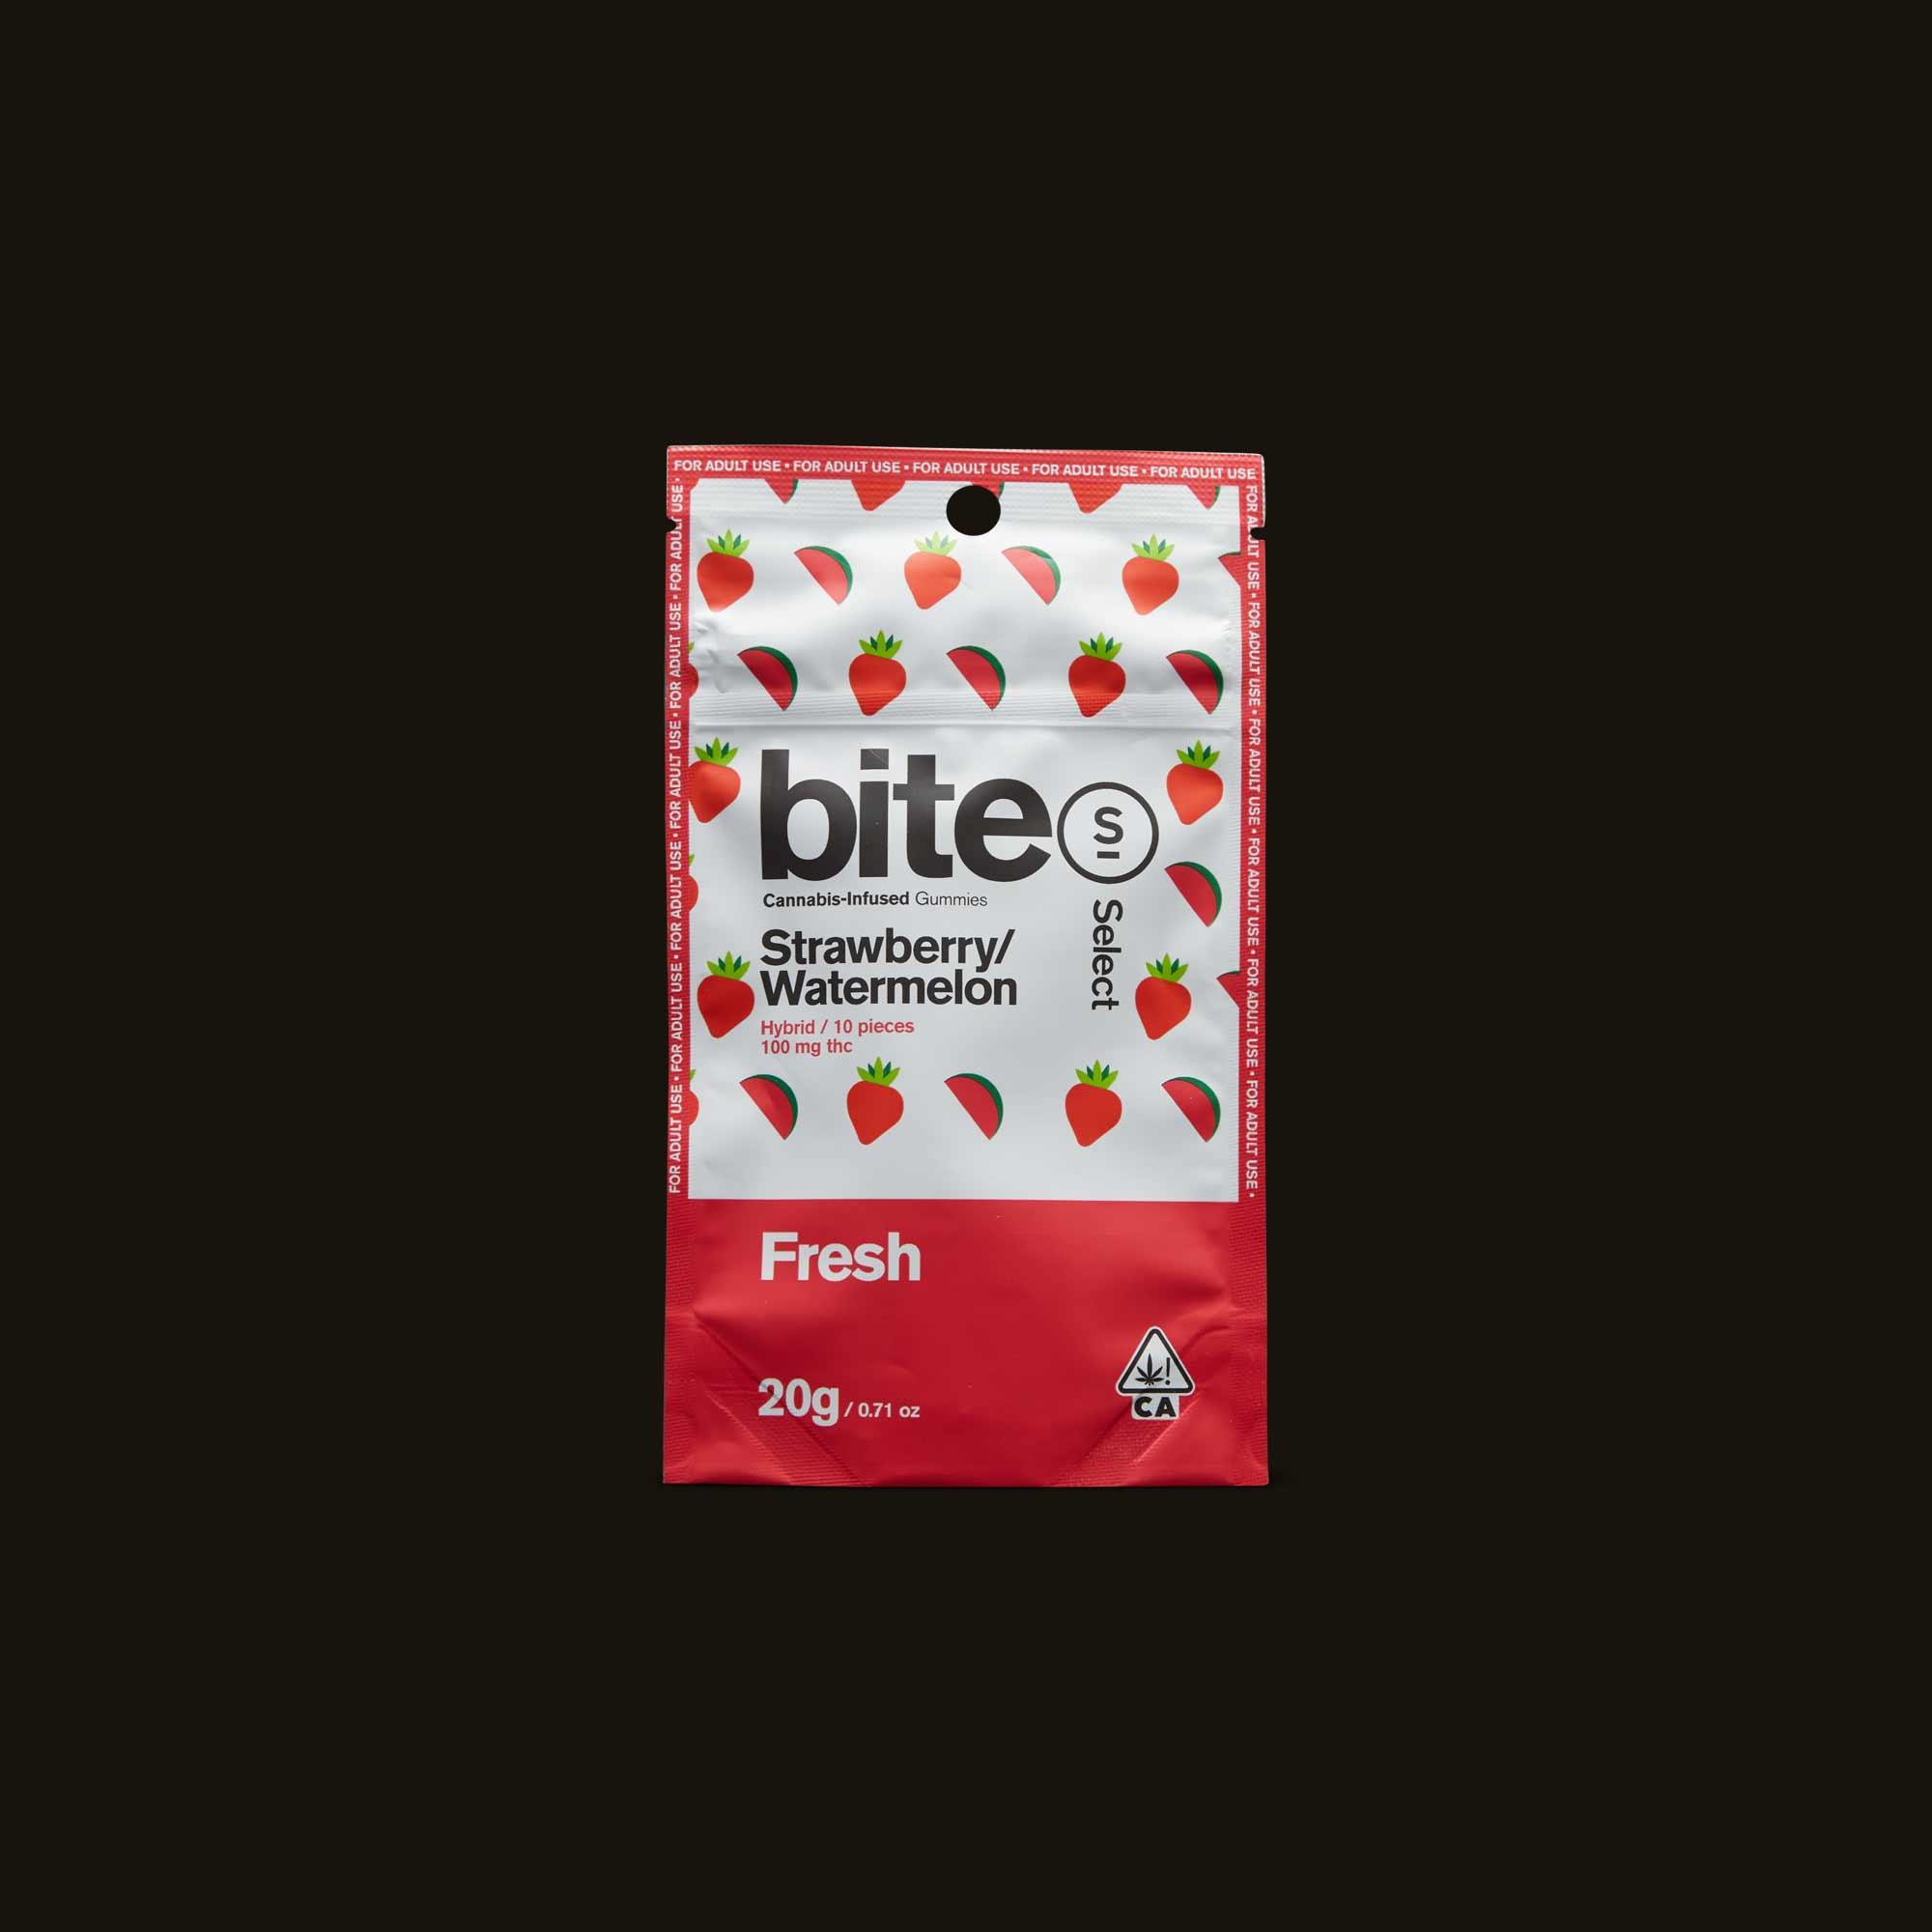 Select Strawberry/Watermelon Bites